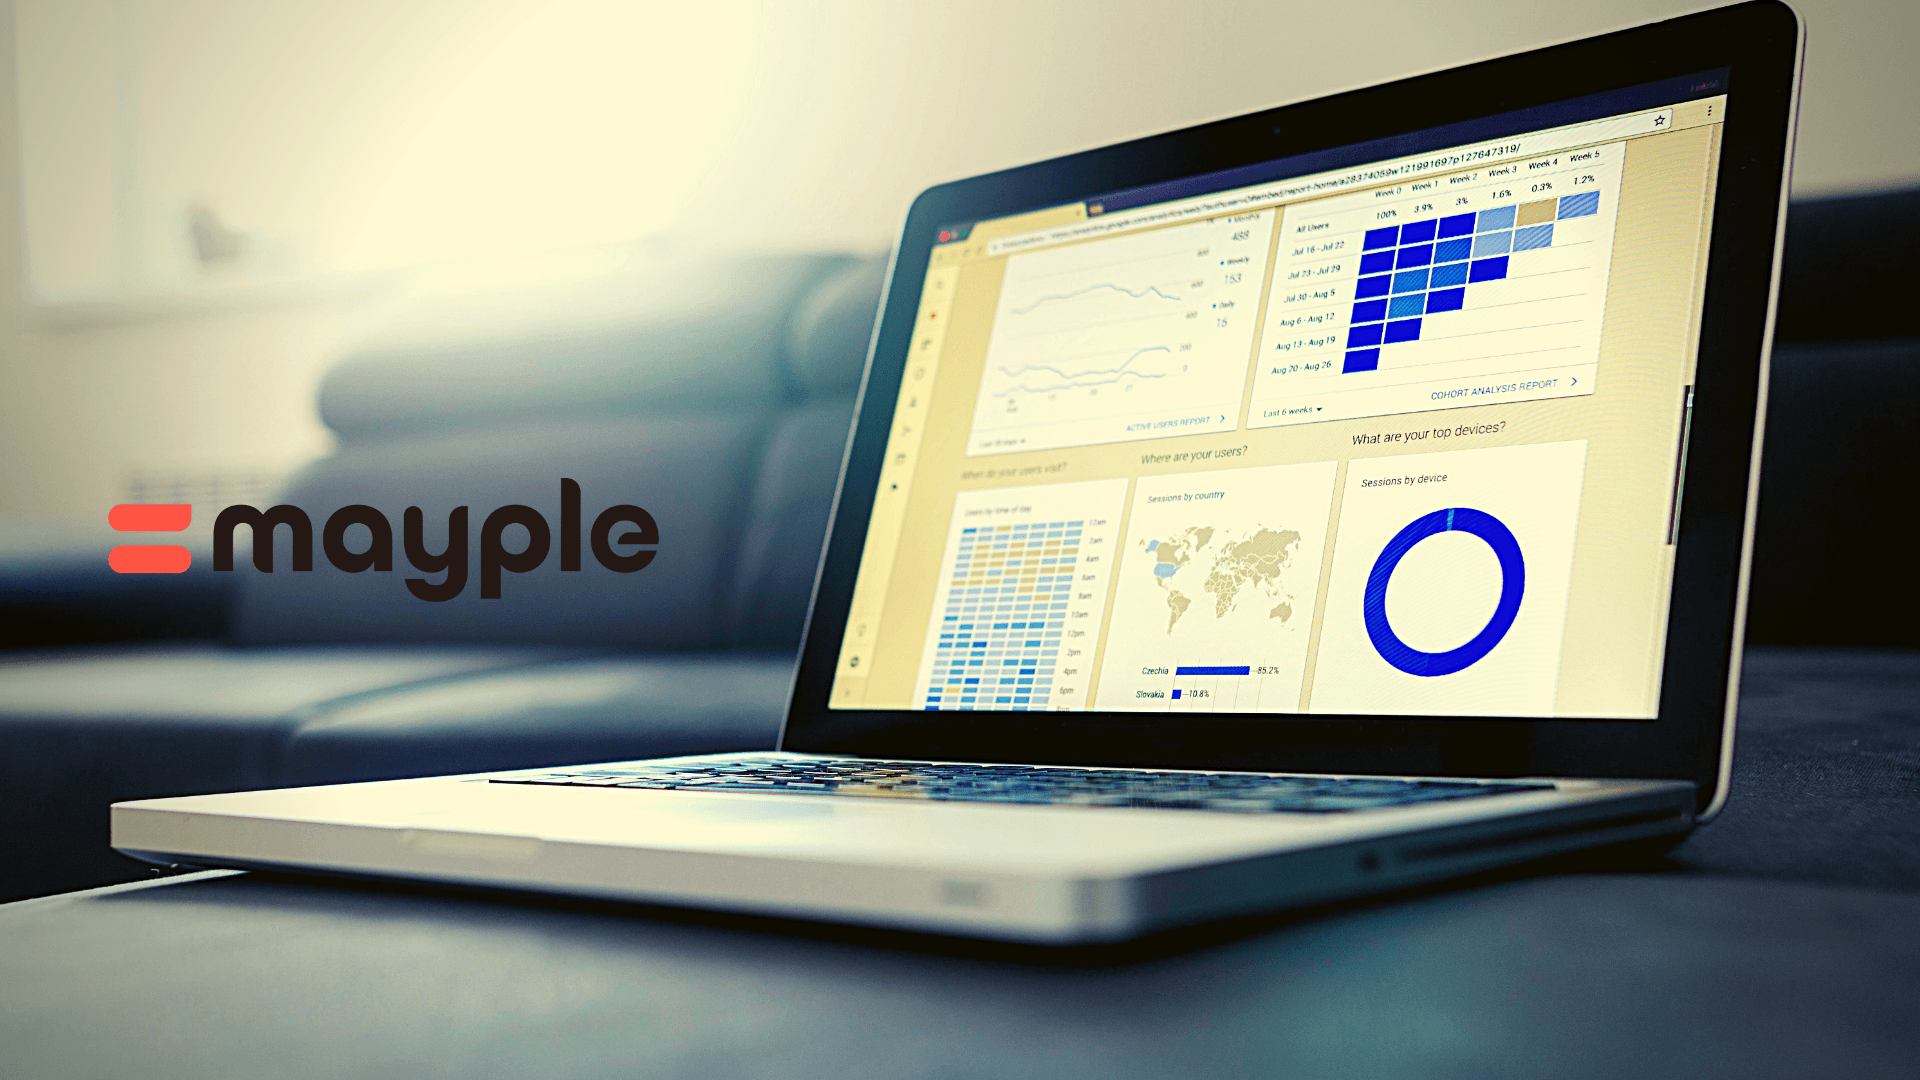 Marketing data on a laptop